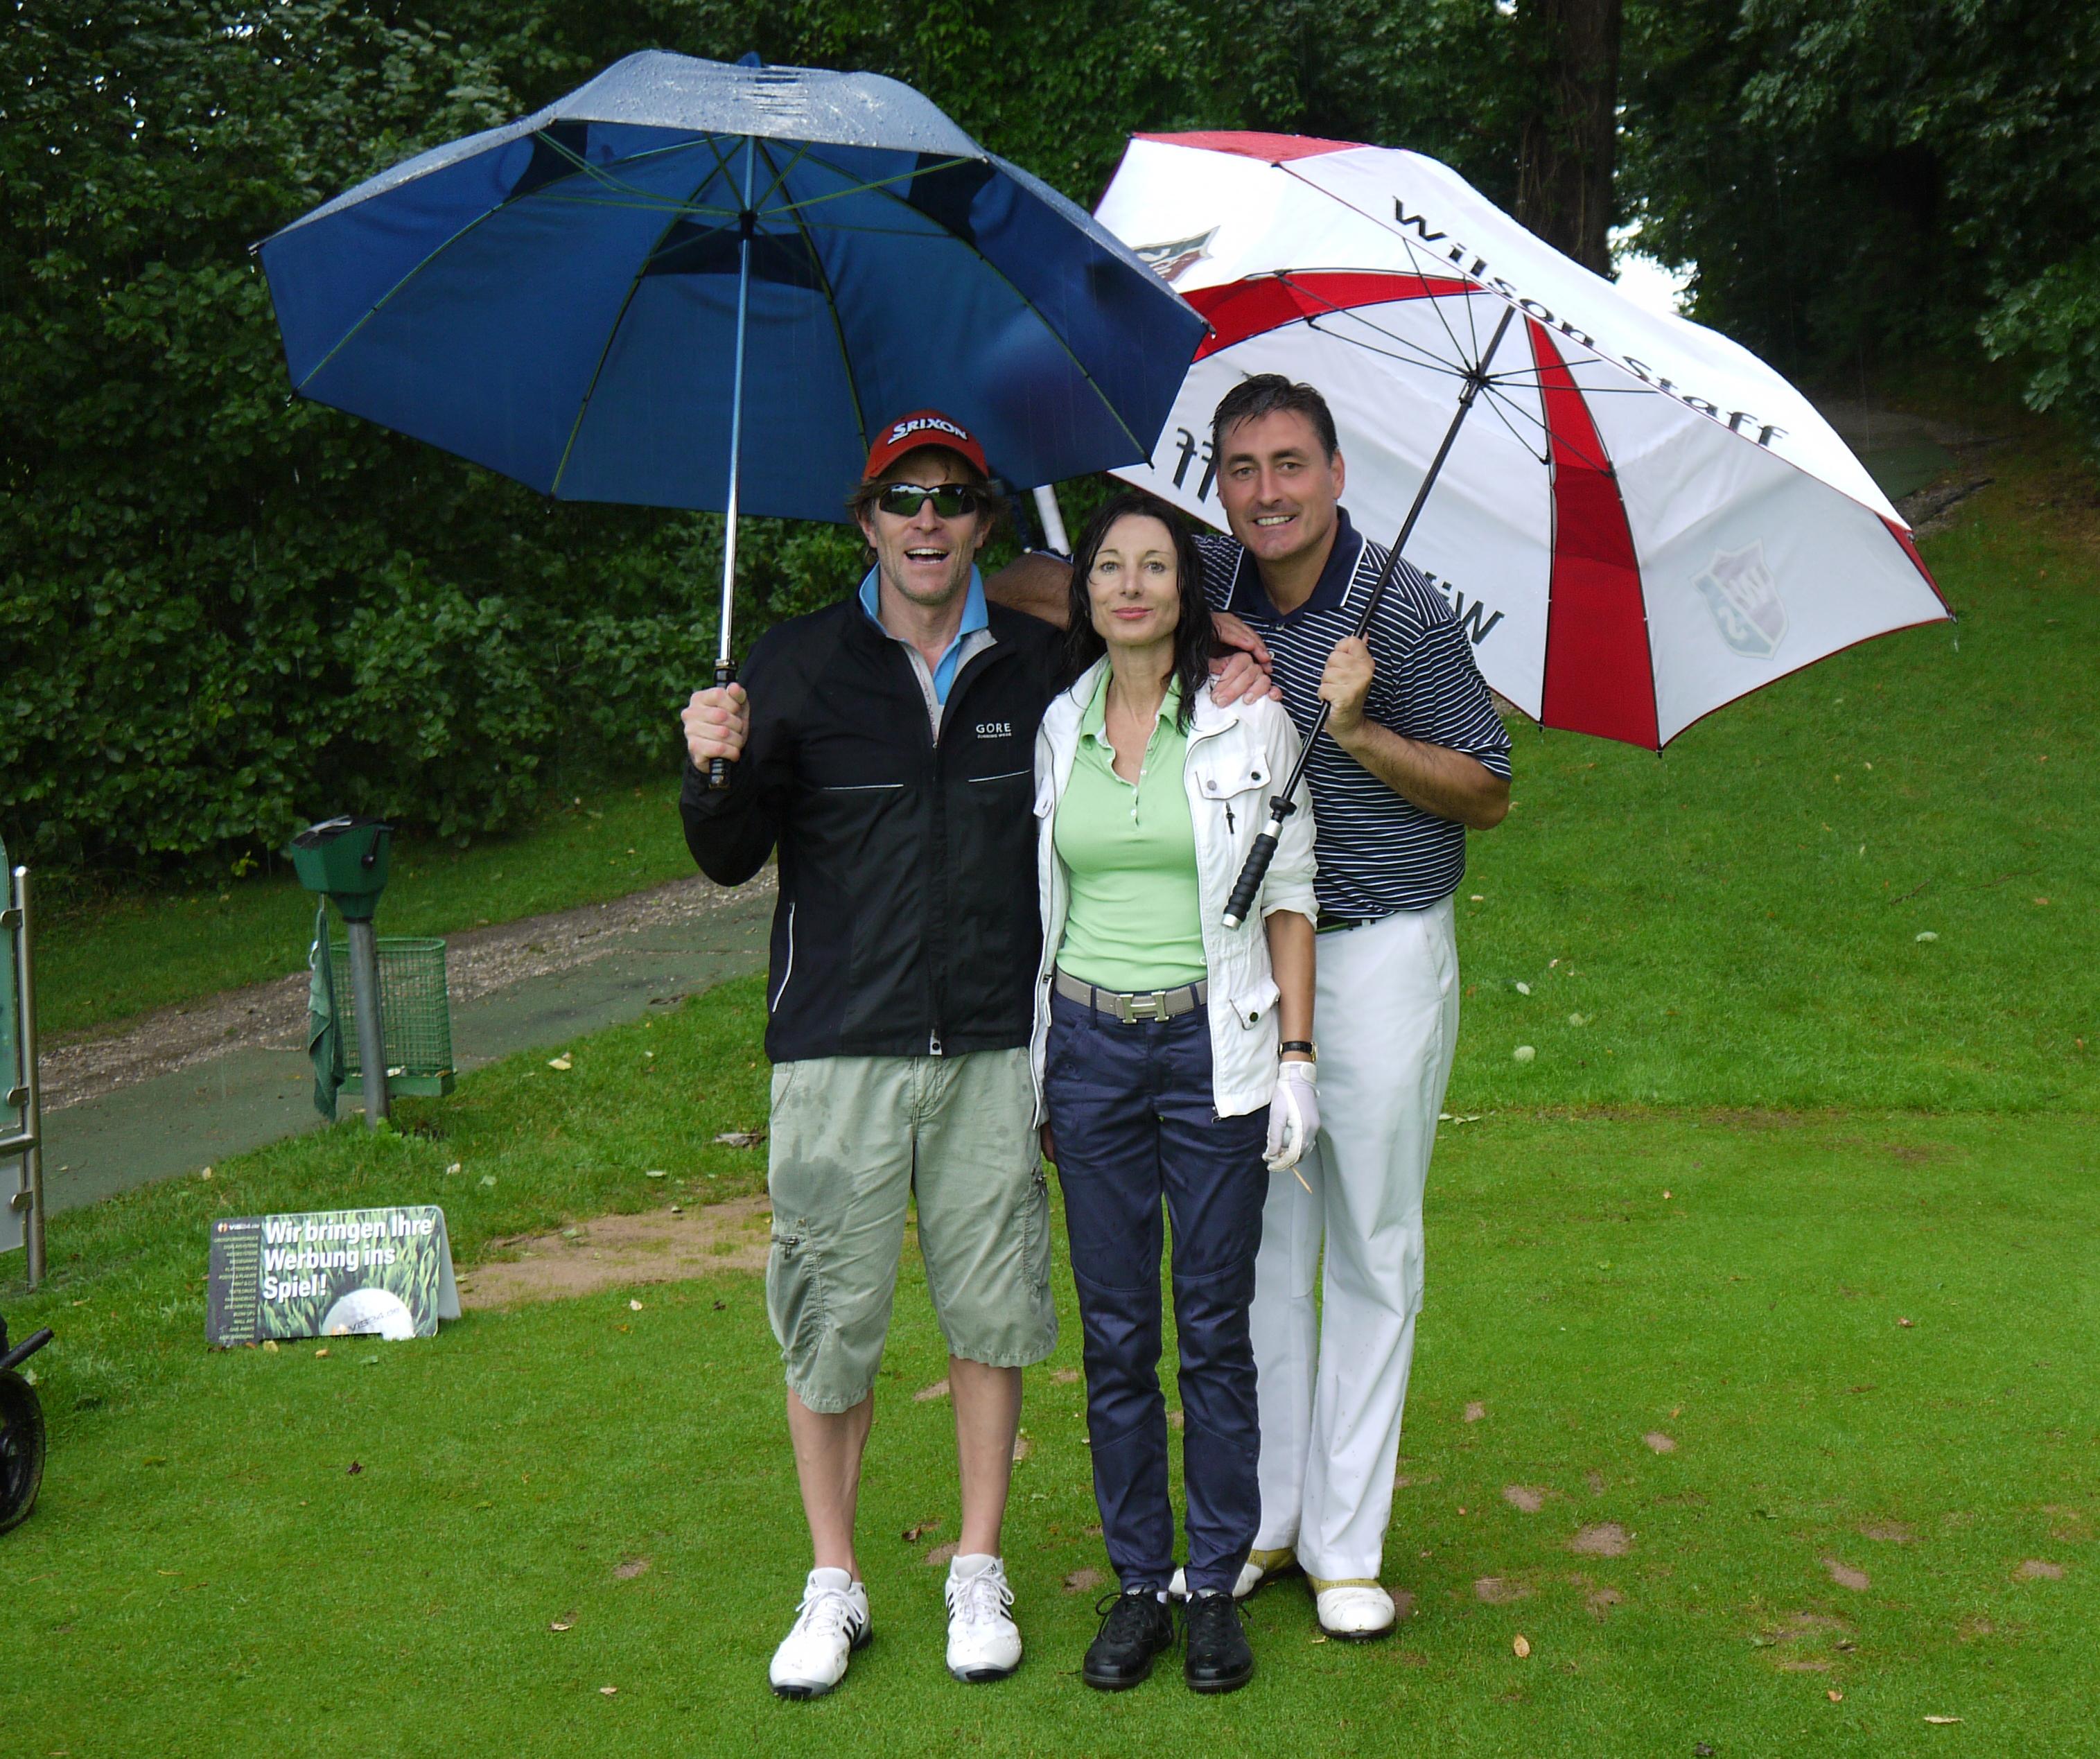 ceo-golfers-world-challenge-2010-21